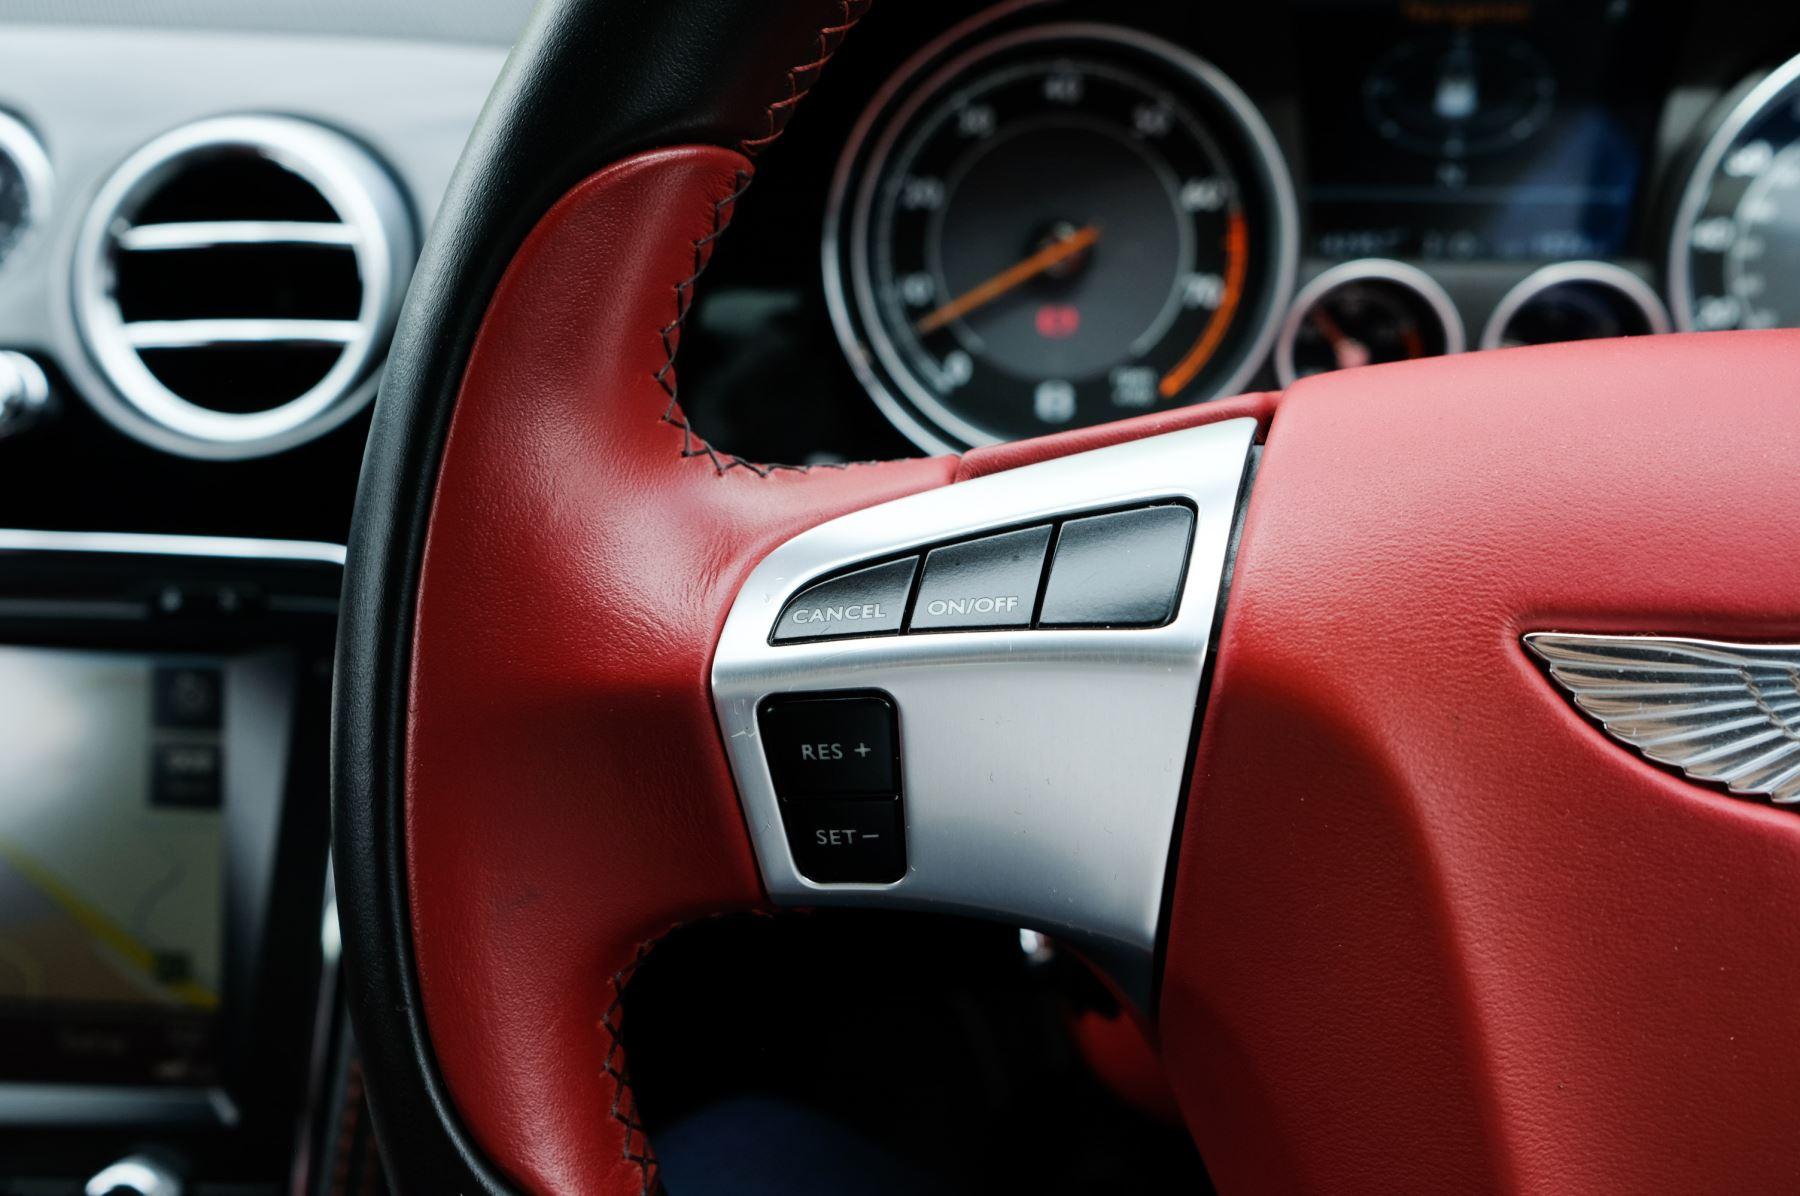 Bentley Continental GTC 6.0 W12 Speed - Massage Seats & Ventilation - Neck Warmer - Rear View Camera image 24